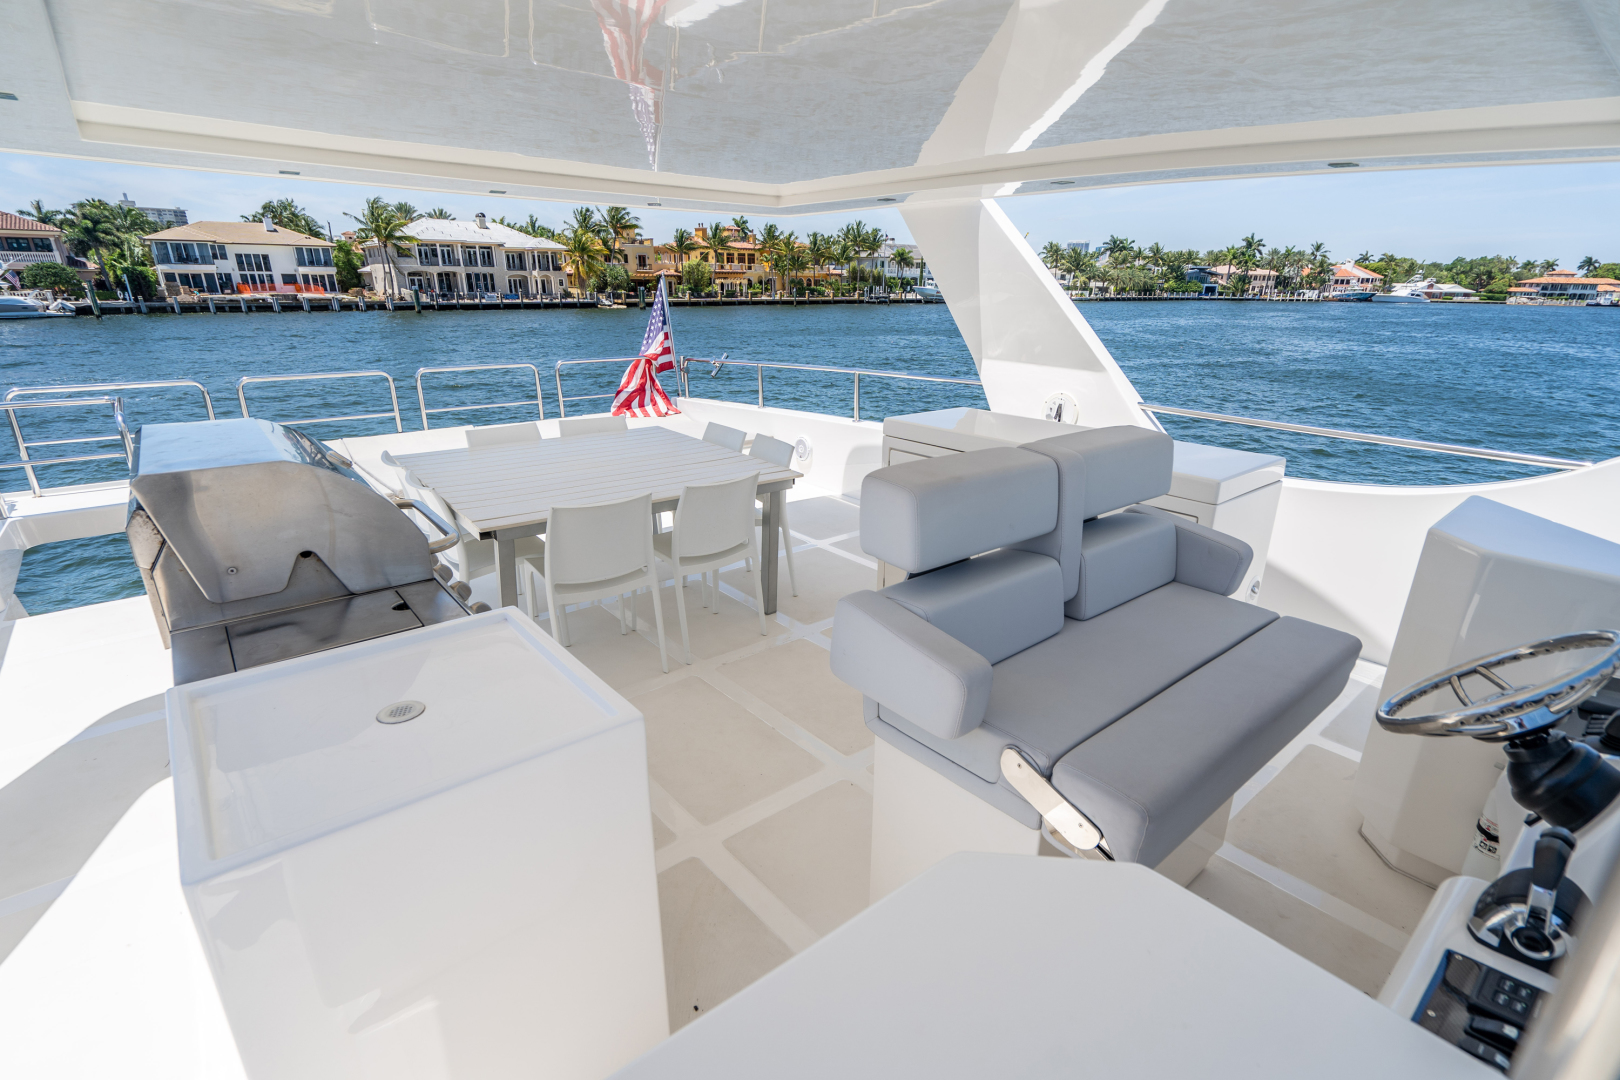 Overblue-58 Power Catamaran 2017-Techuila Ft. Lauderdale-Florida-United States-2017 Overblue 58 Powercat-1401200   Thumbnail